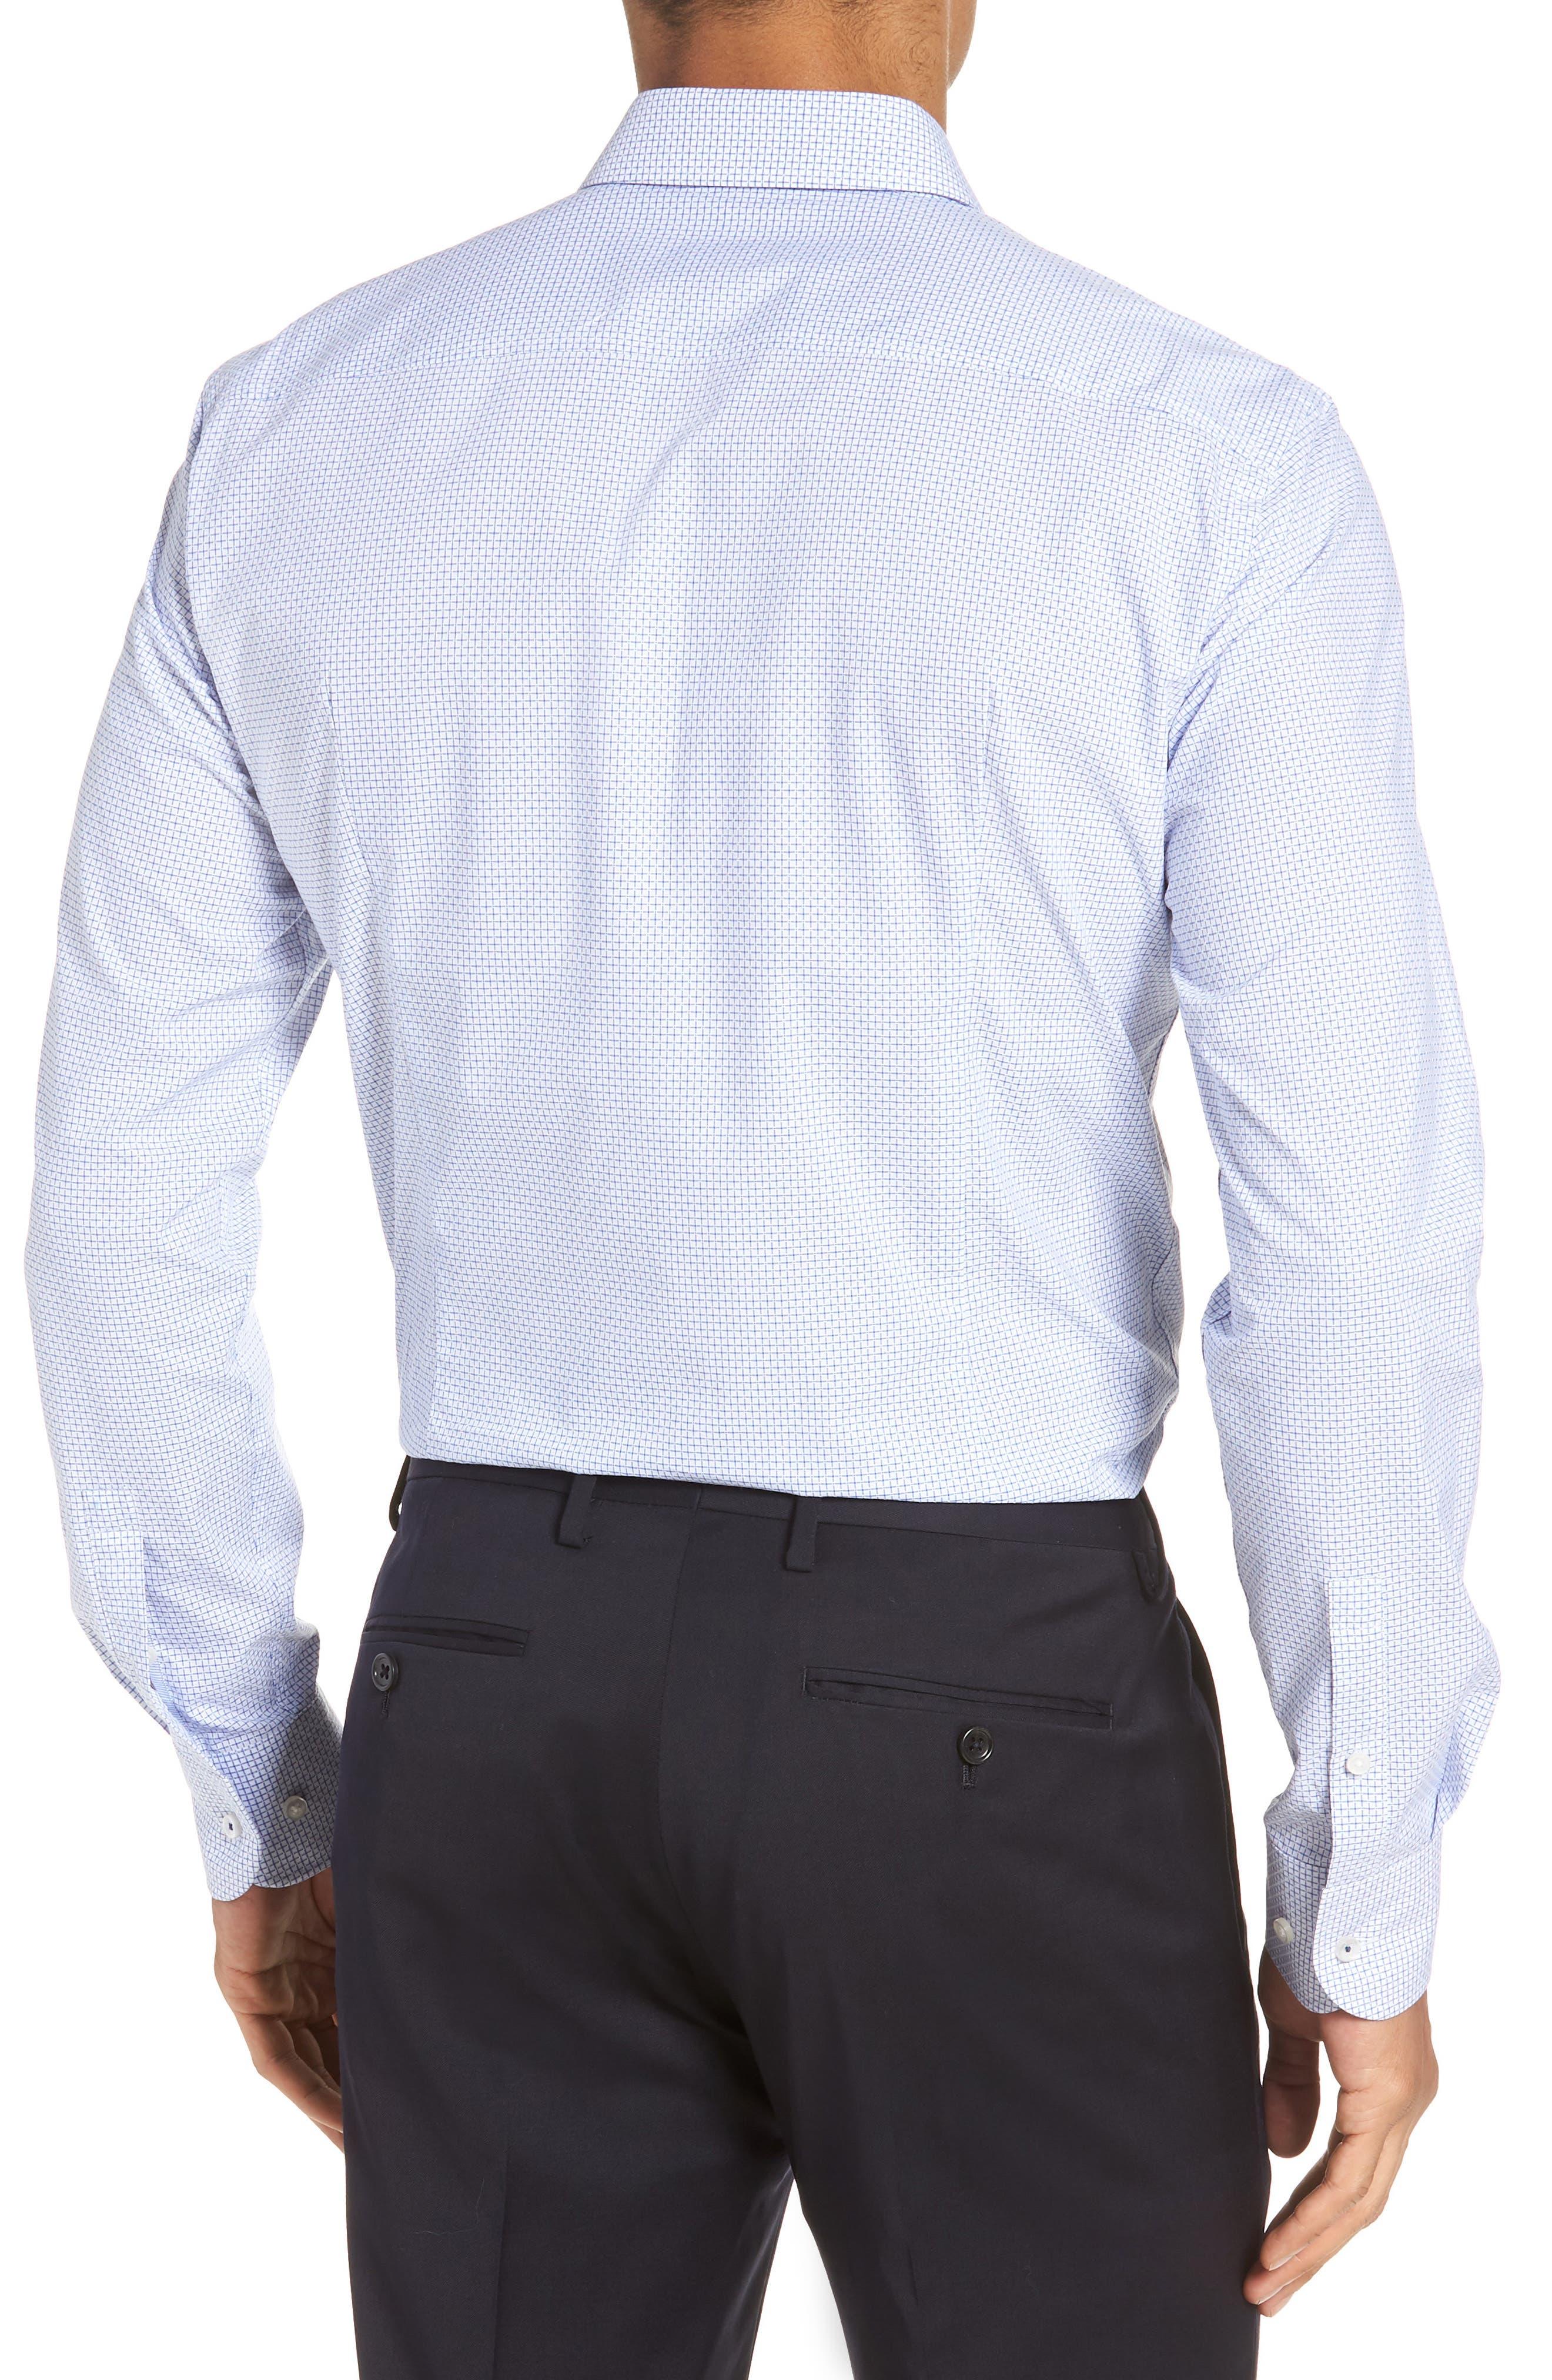 BOSS,                             Jesse Slim Fit Check Dress Shirt,                             Alternate thumbnail 3, color,                             431